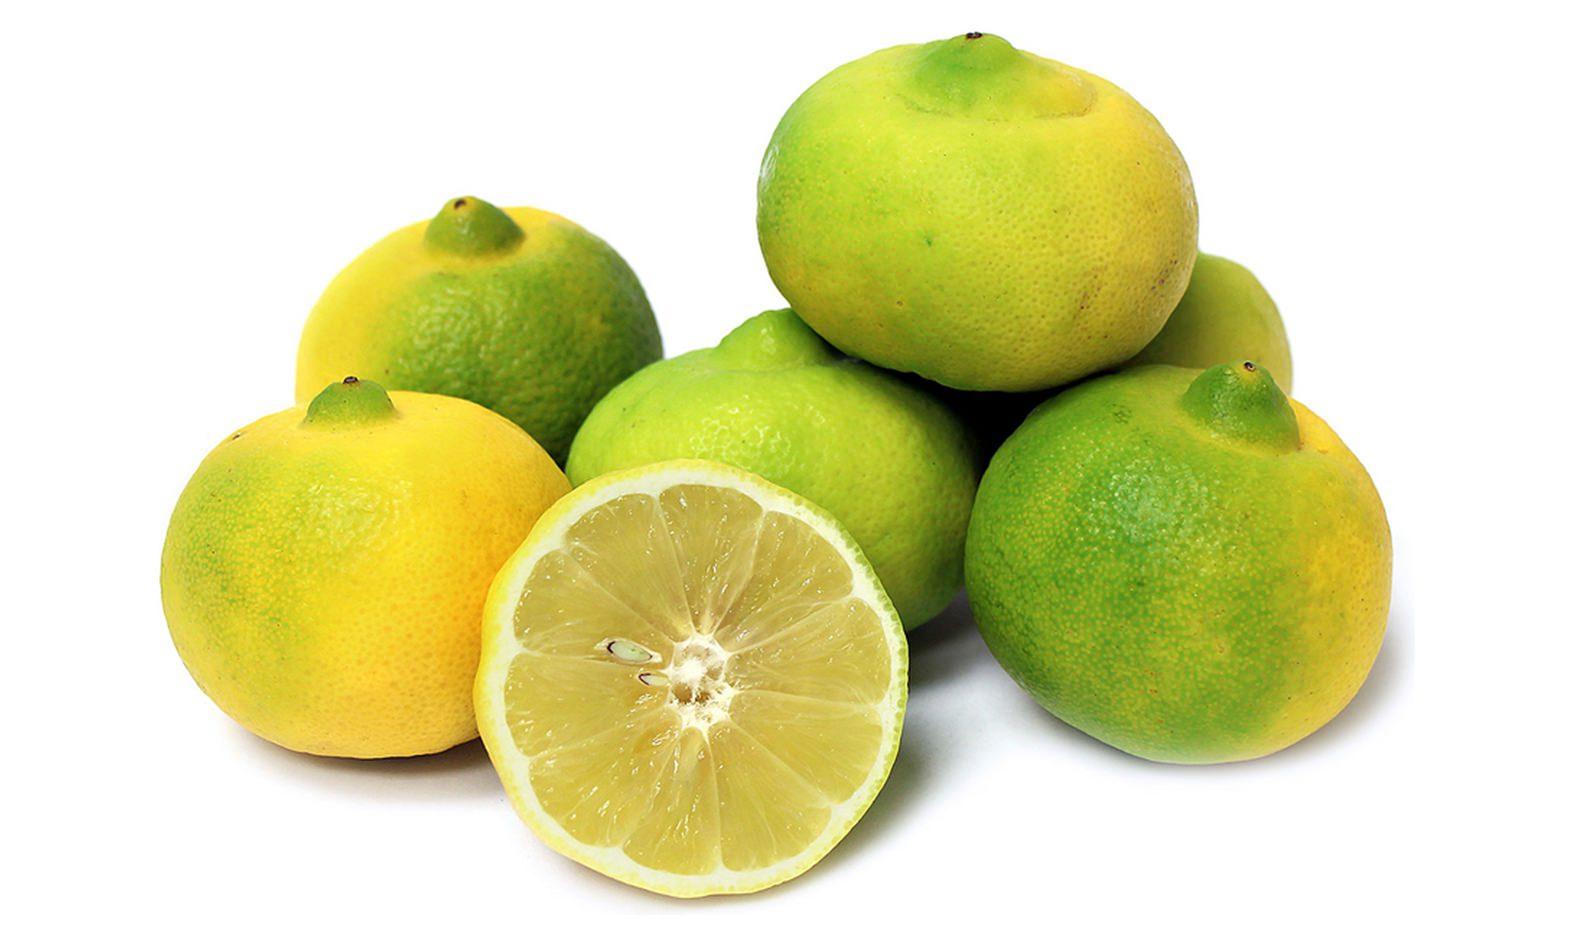 Sweet Limes Image